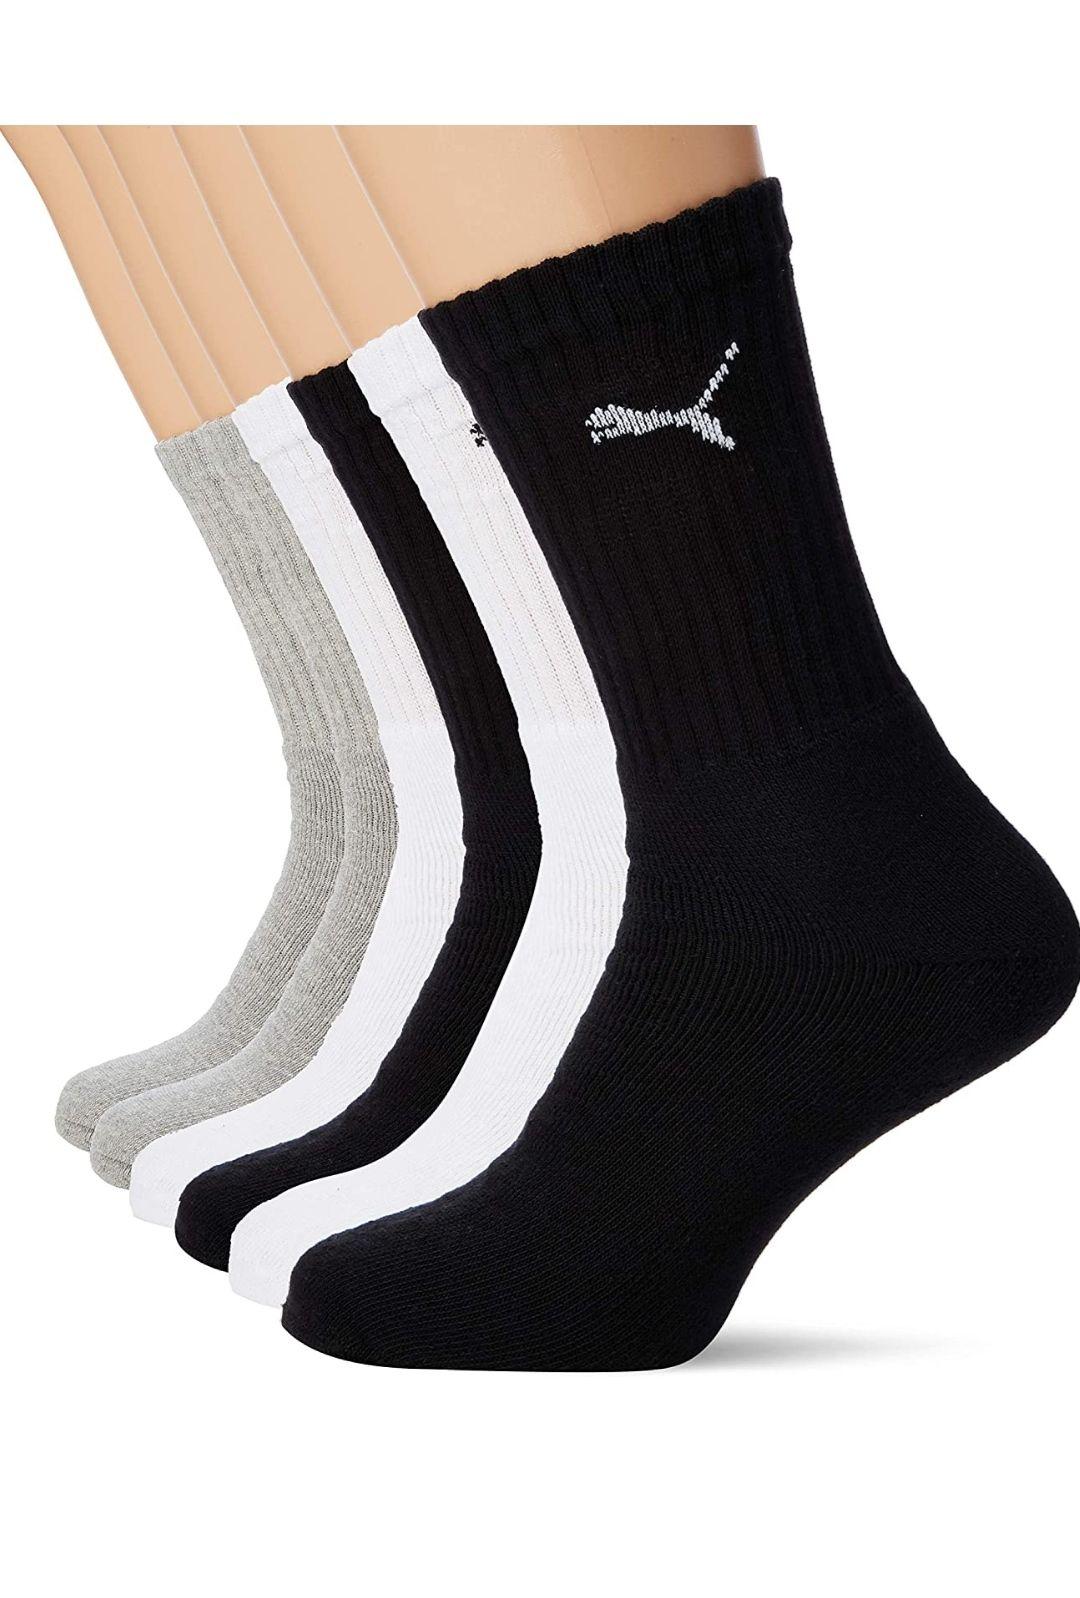 Calcetines deportivos pack 6 Puma talla 39- 46